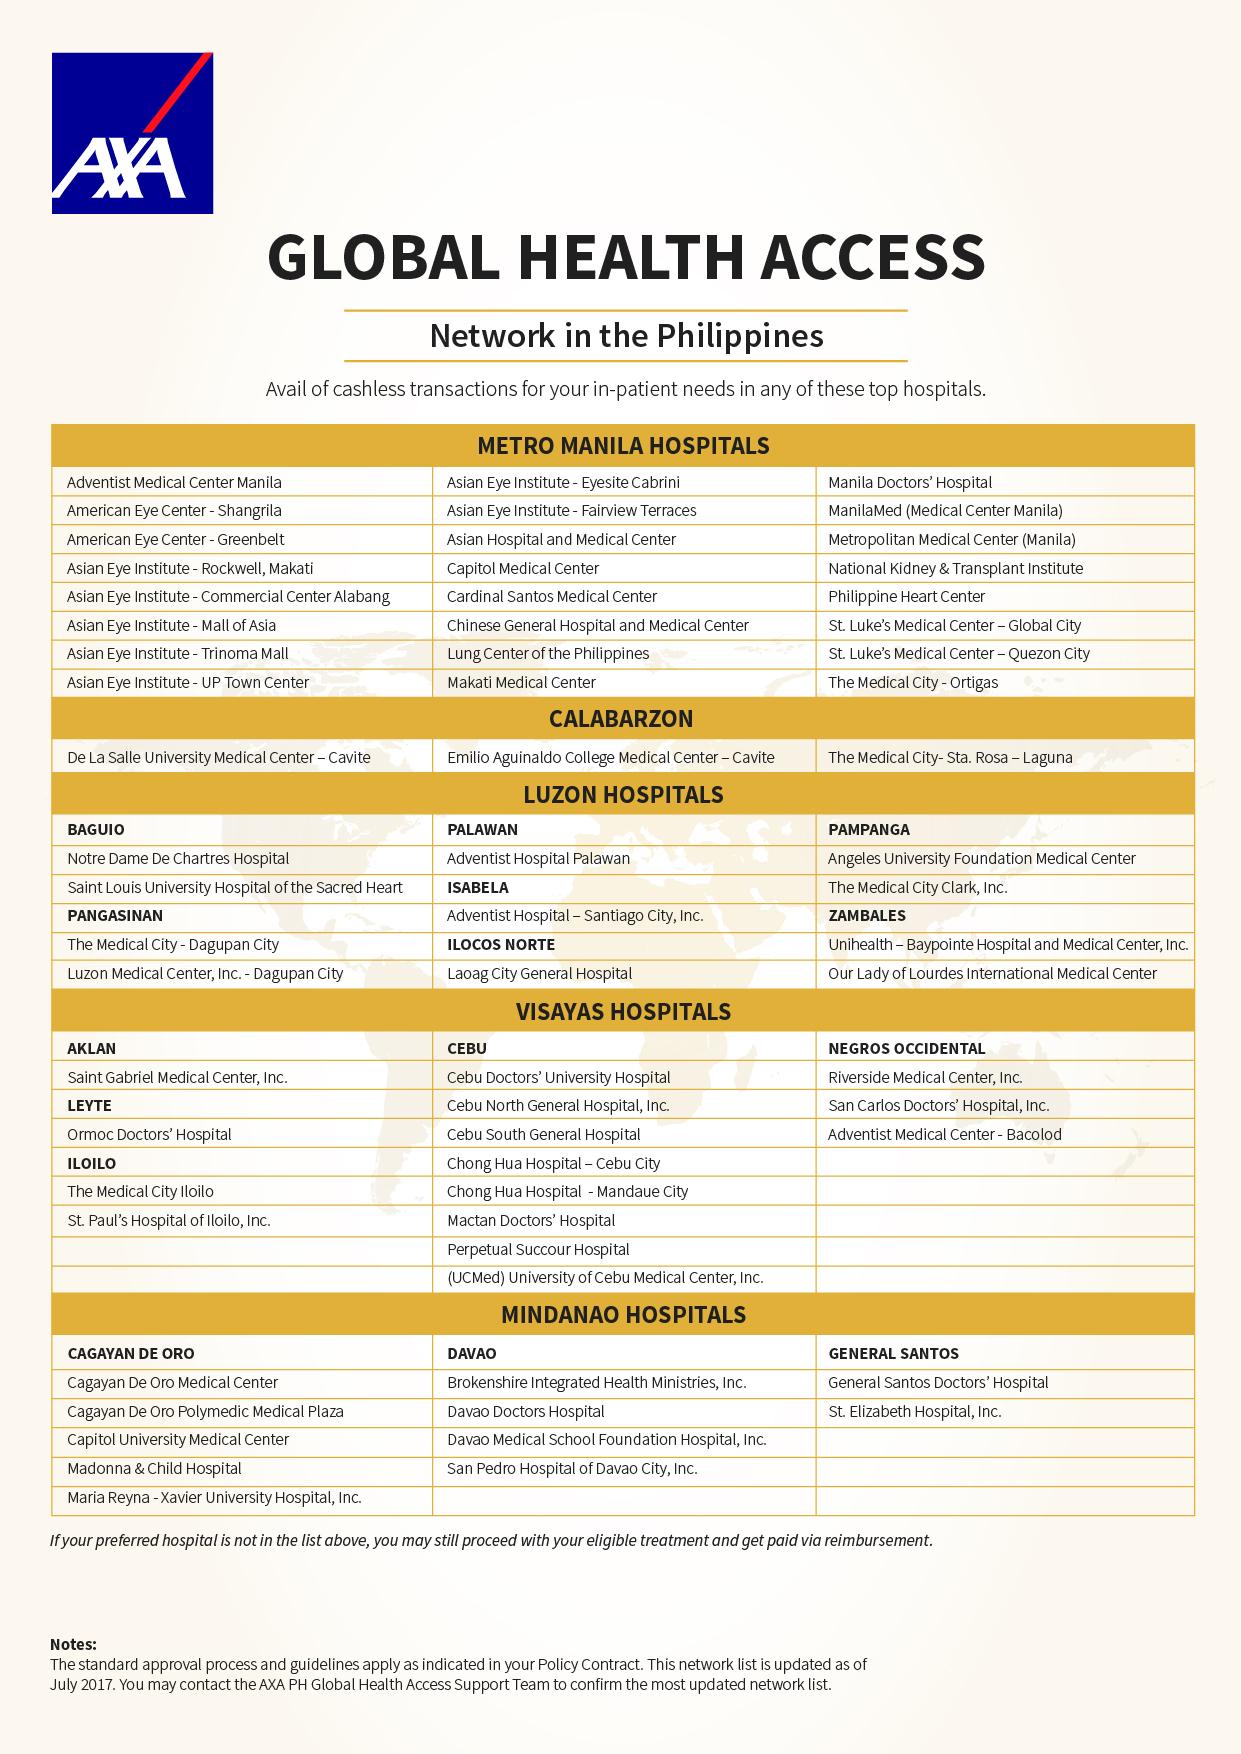 Manila Girl: AXA Health Max/Global Health Access/ Health